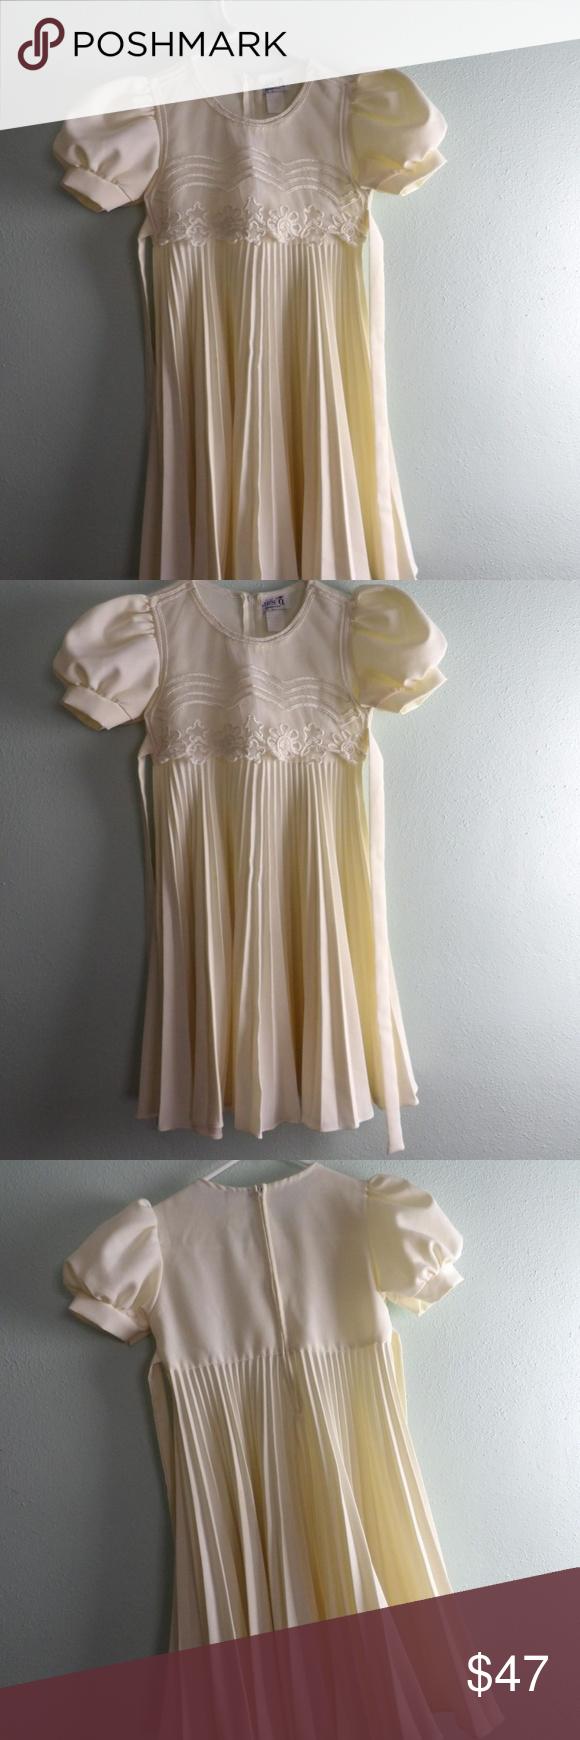 Cream colored vintage wedding dresses  BT Kids Girls Chiffon Wedding Dress Vintage E  My Posh Closet